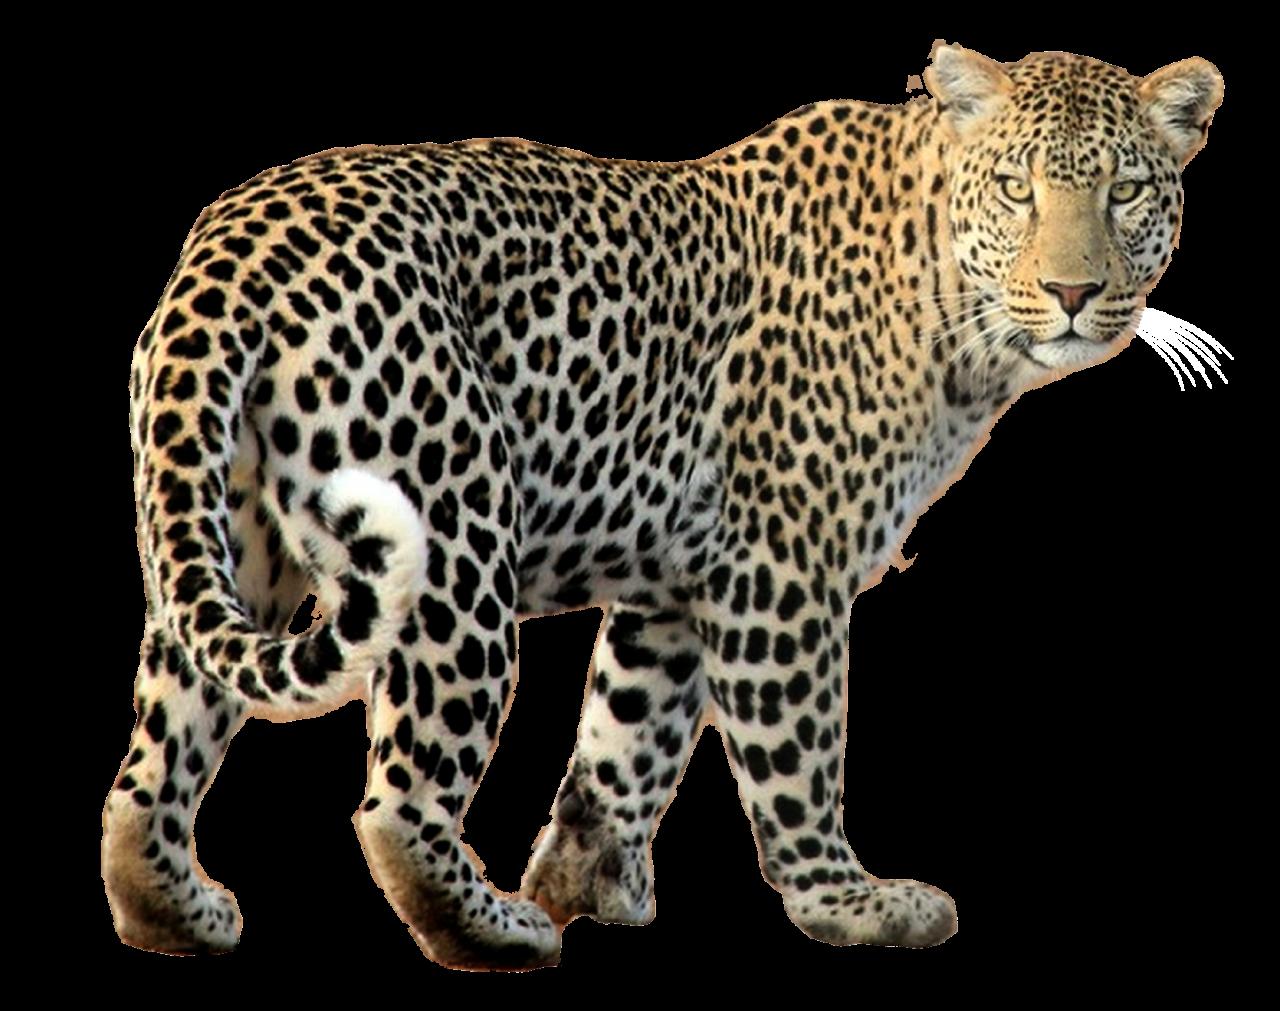 Leopard Walking PNG Image